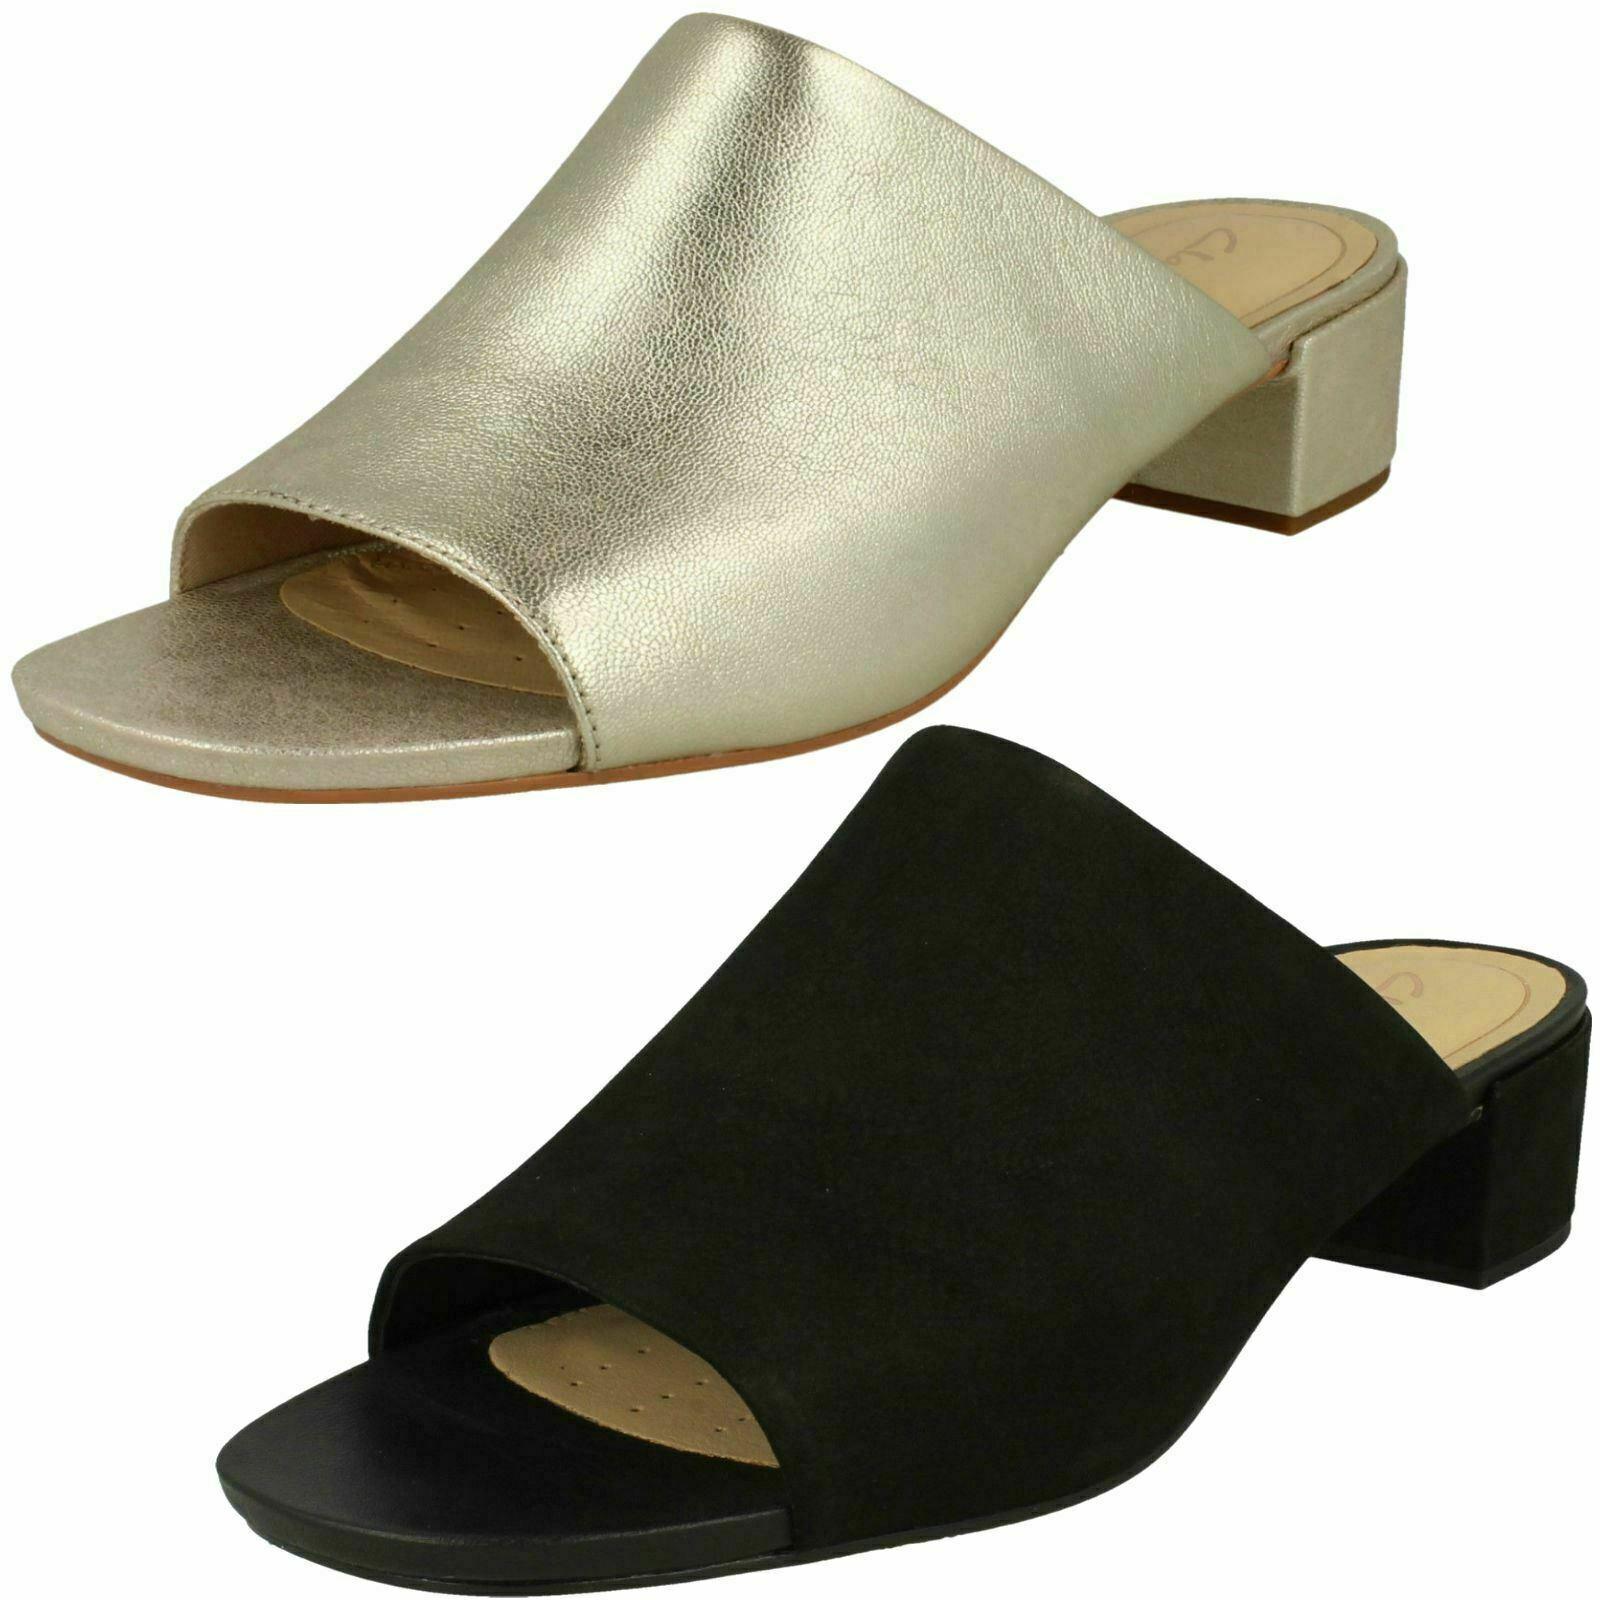 Ladies Clarks Orabella Daisy Smart Mule Heeled Sandals - D Fitting